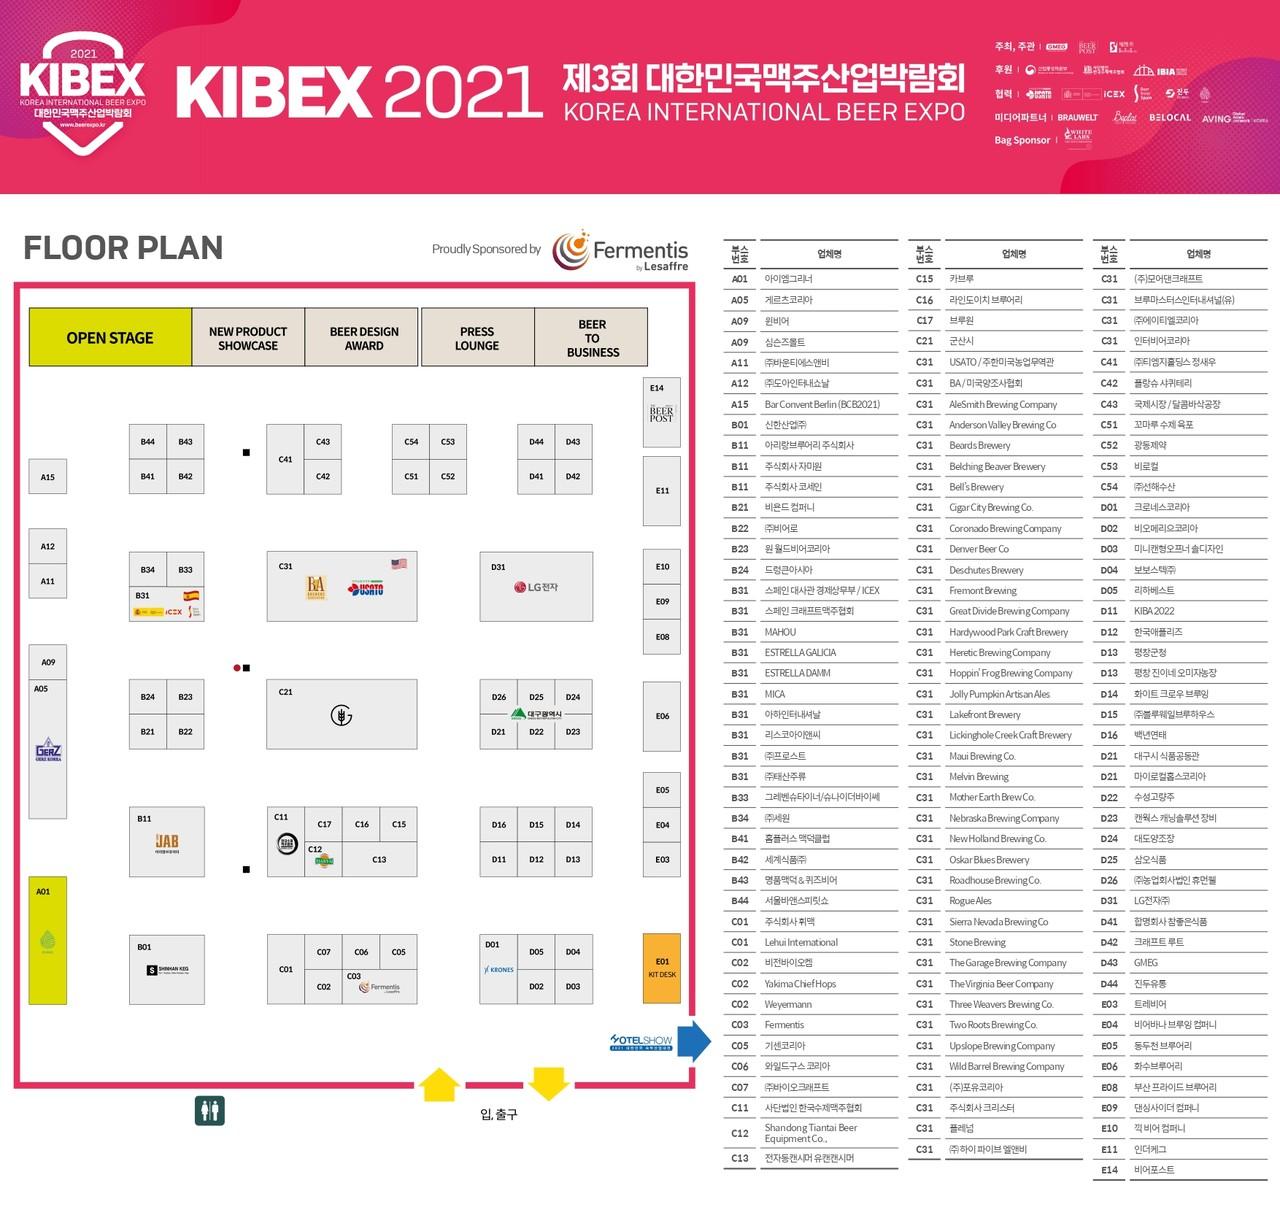 ▲ KIBEX 공식 홈페이지에서 제공한 박람회장 약도지만 시음장소는 찾아볼 수 없다